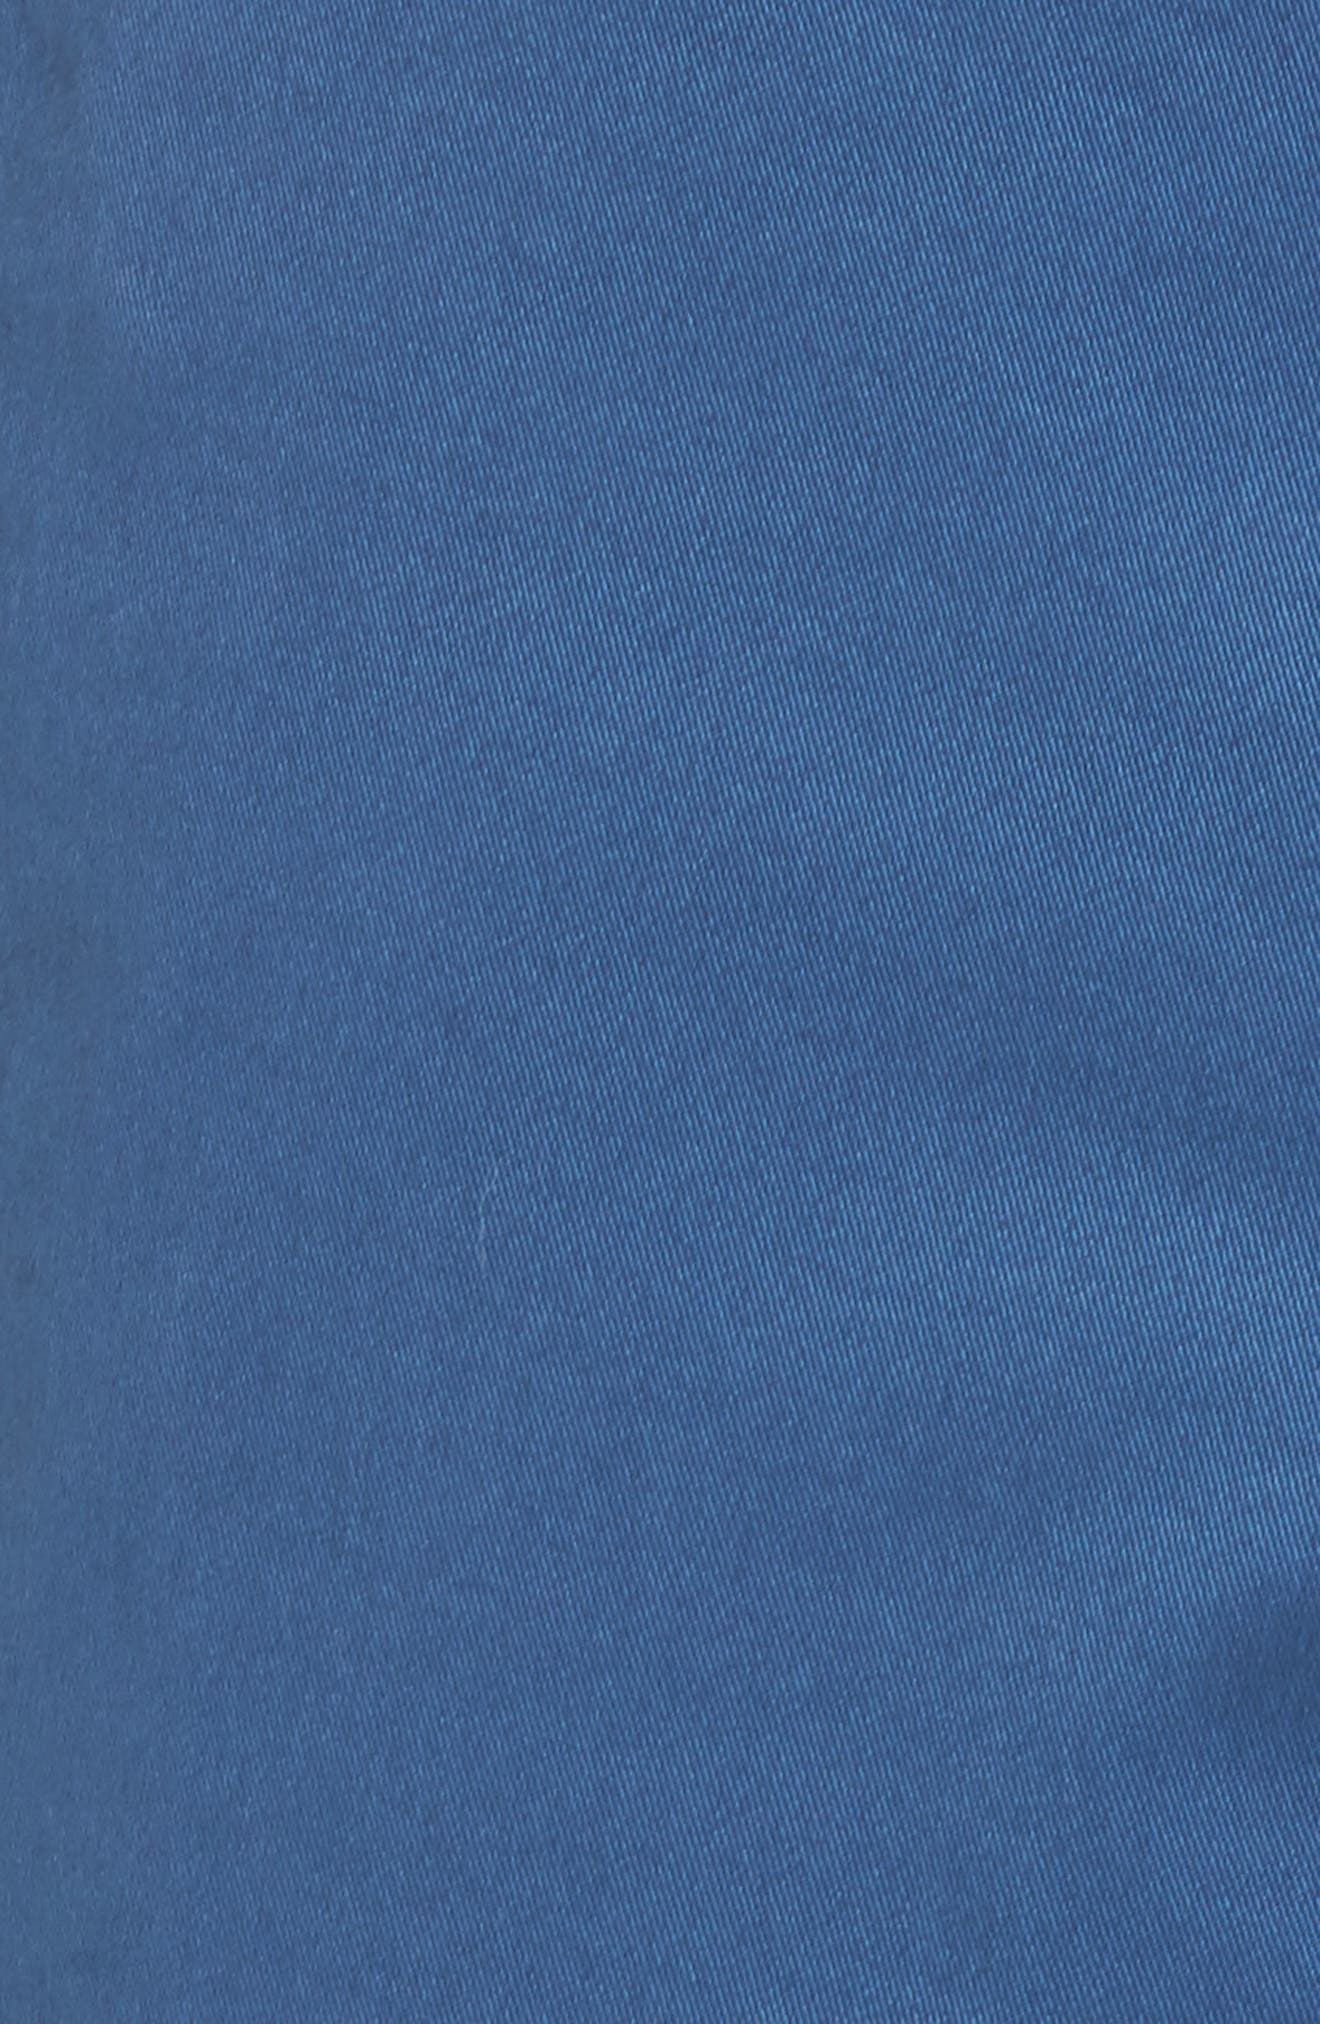 Proshor Slim Fit Chino Shorts,                             Alternate thumbnail 9, color,                             Dark Blue